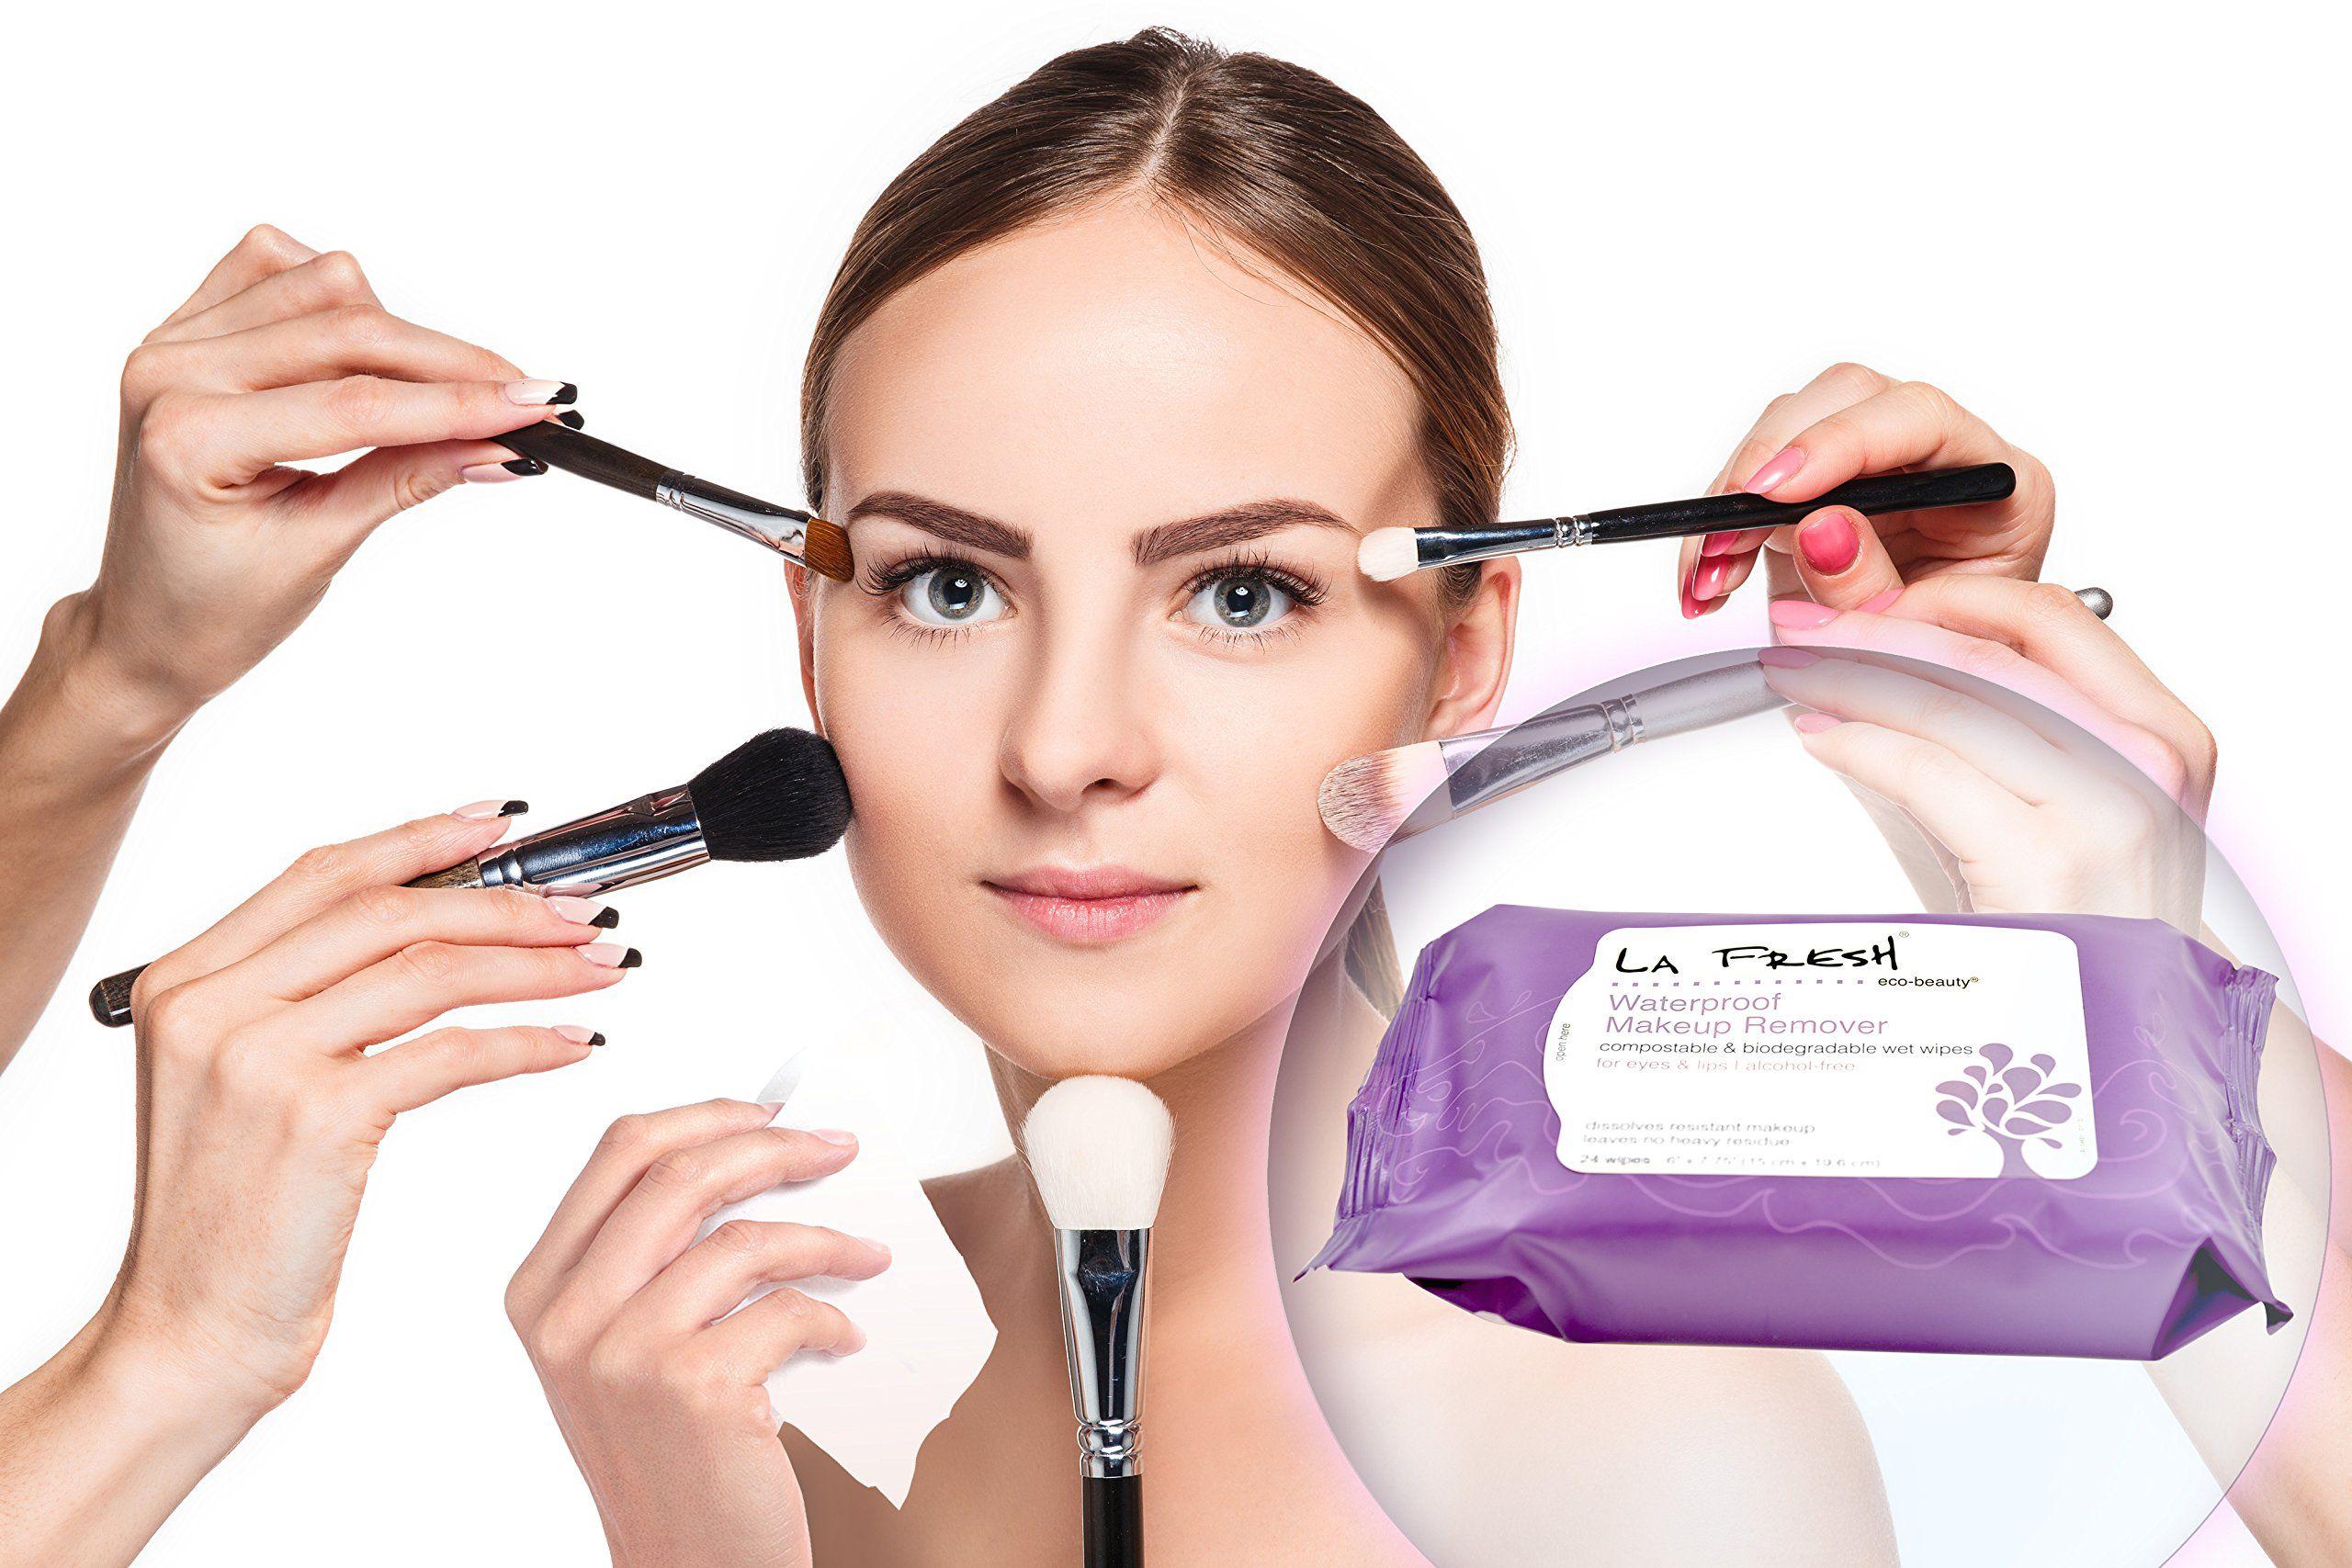 La Fresh EcoBeauty Waterproof Makeup Remover Travel Wipes